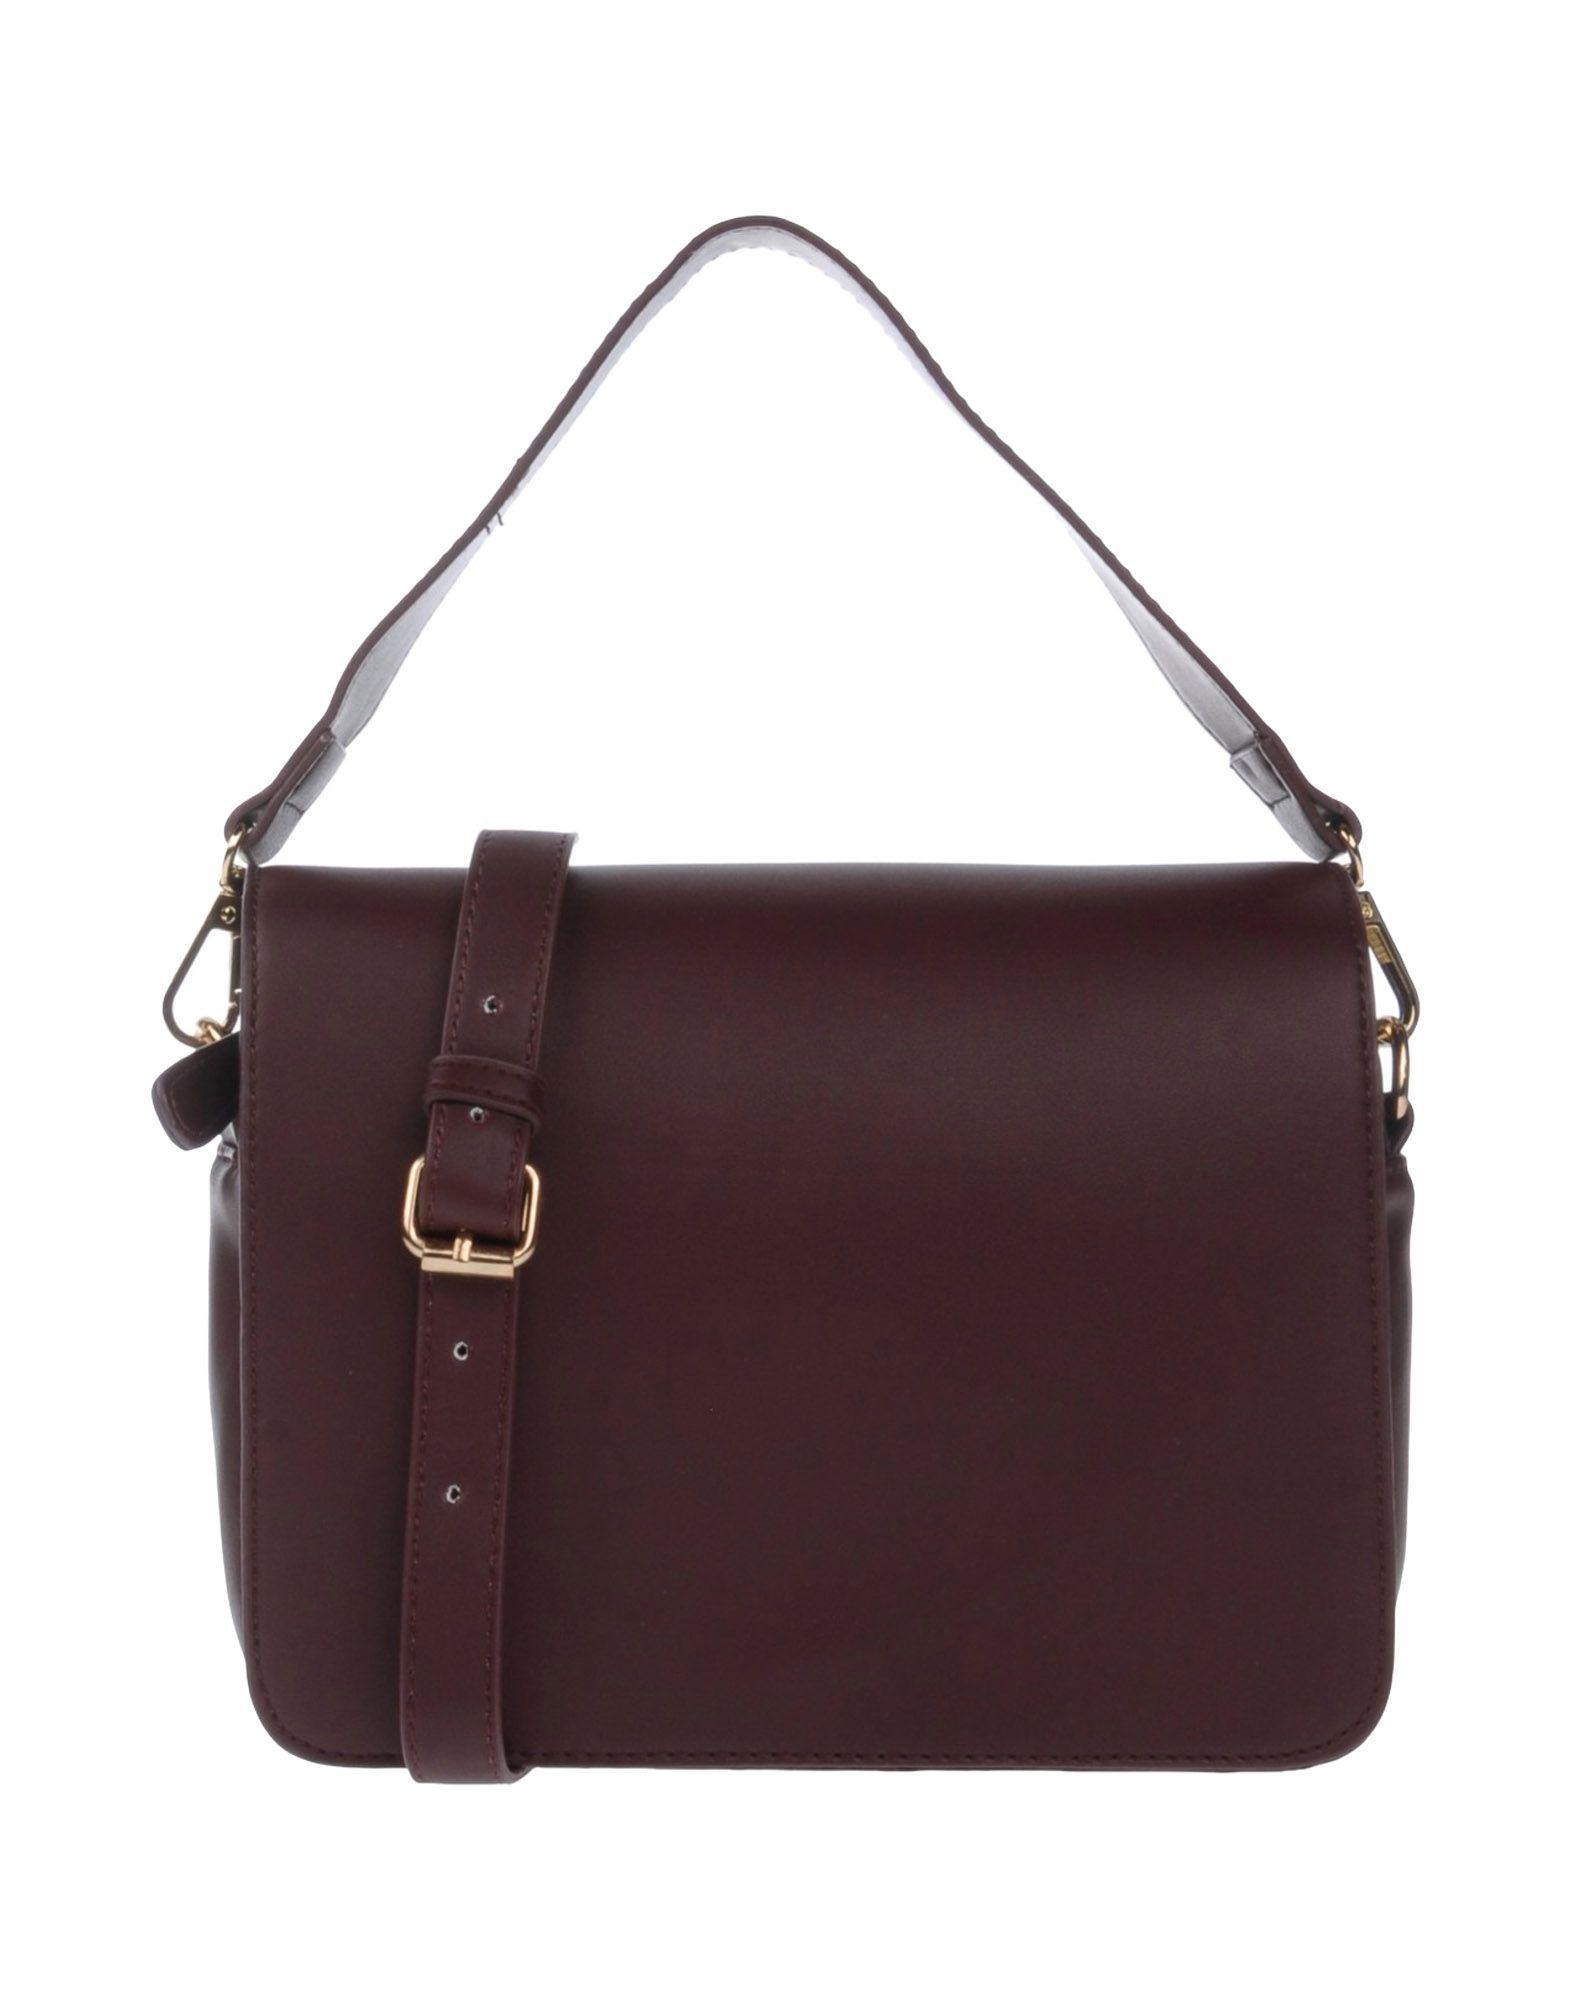 6fc9200d5928 Ashbury Large Leather Shoulder Bag by Michael Kors